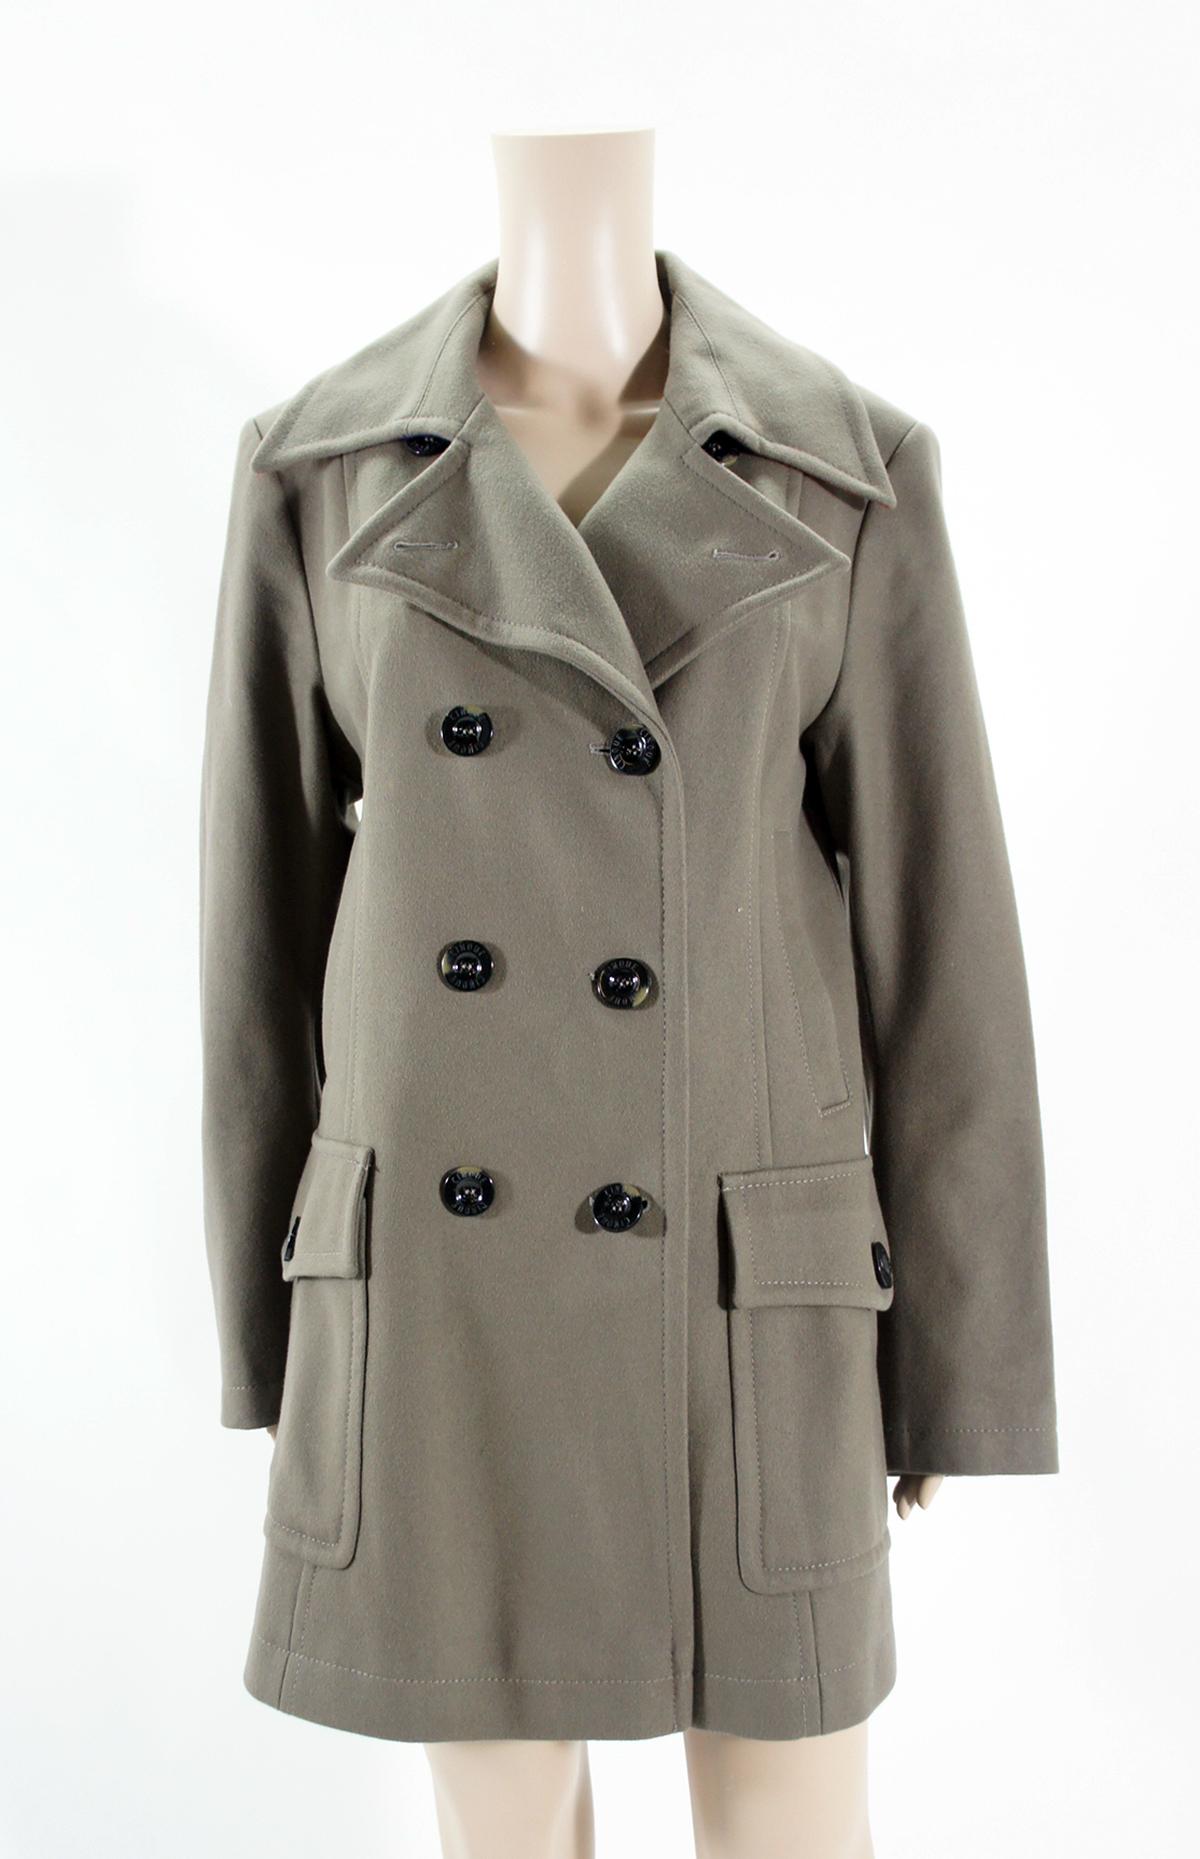 cinque damen mantel damenmantel wolle kaschmir gr 40 ebay. Black Bedroom Furniture Sets. Home Design Ideas